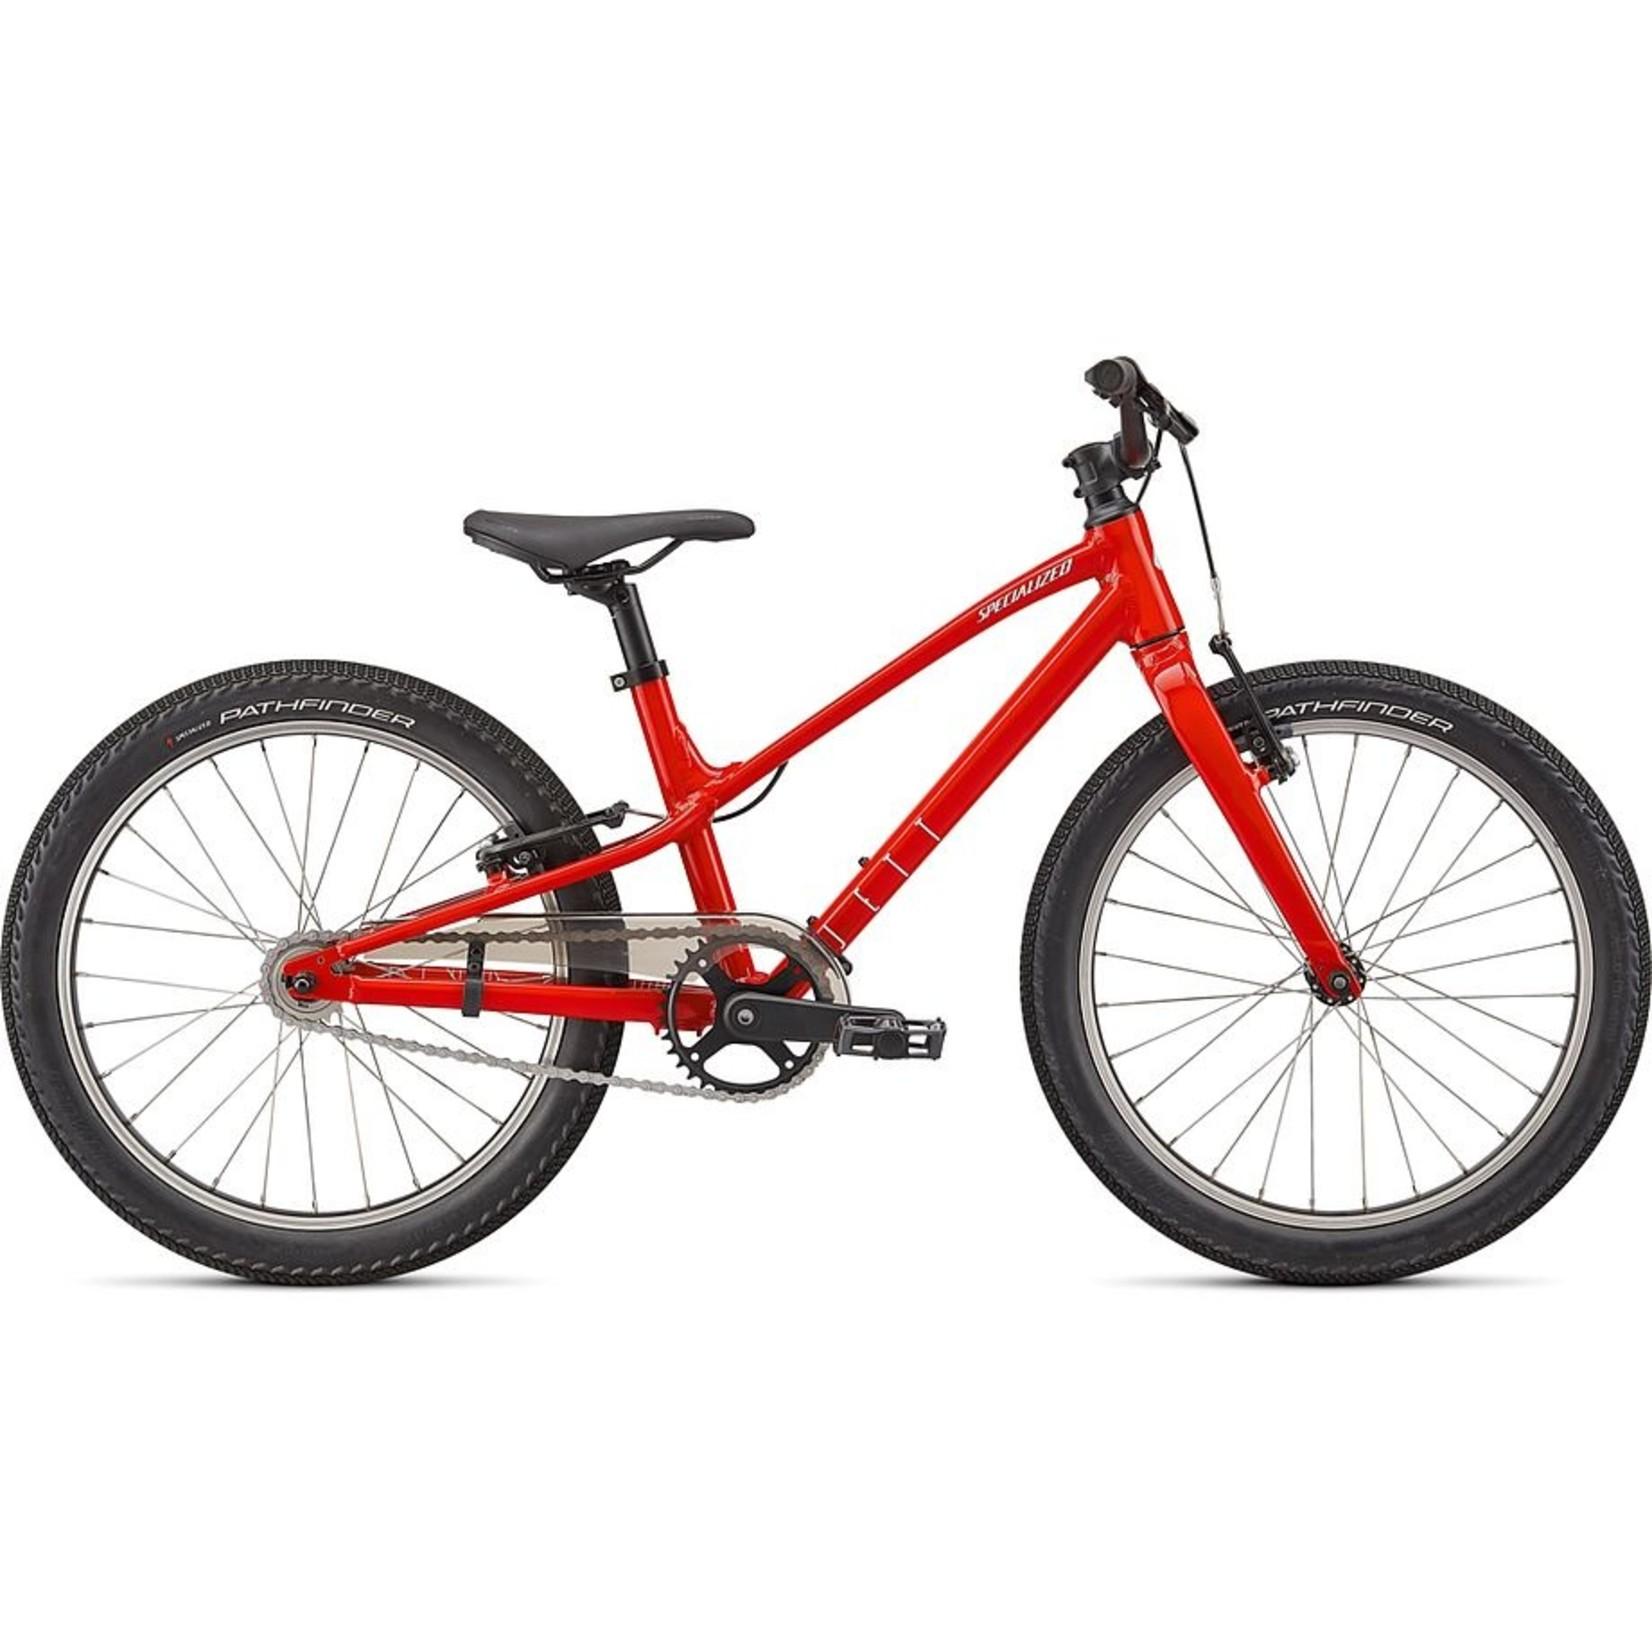 Specialized JETT 16 FLO RED/BLACK